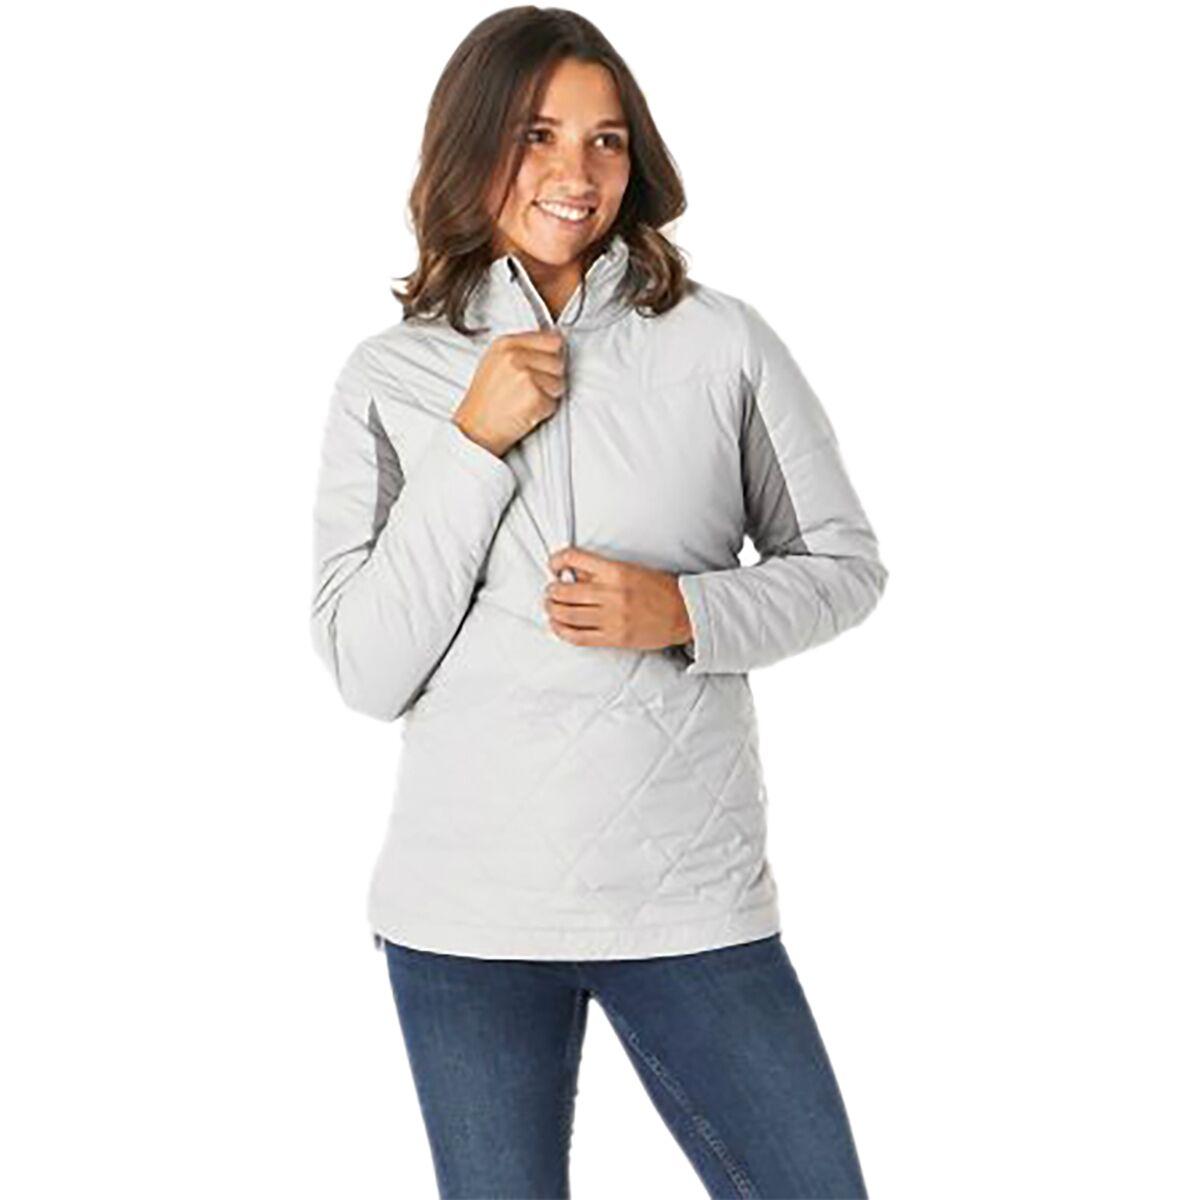 Smartwool Smartloft-X 60 Pullover